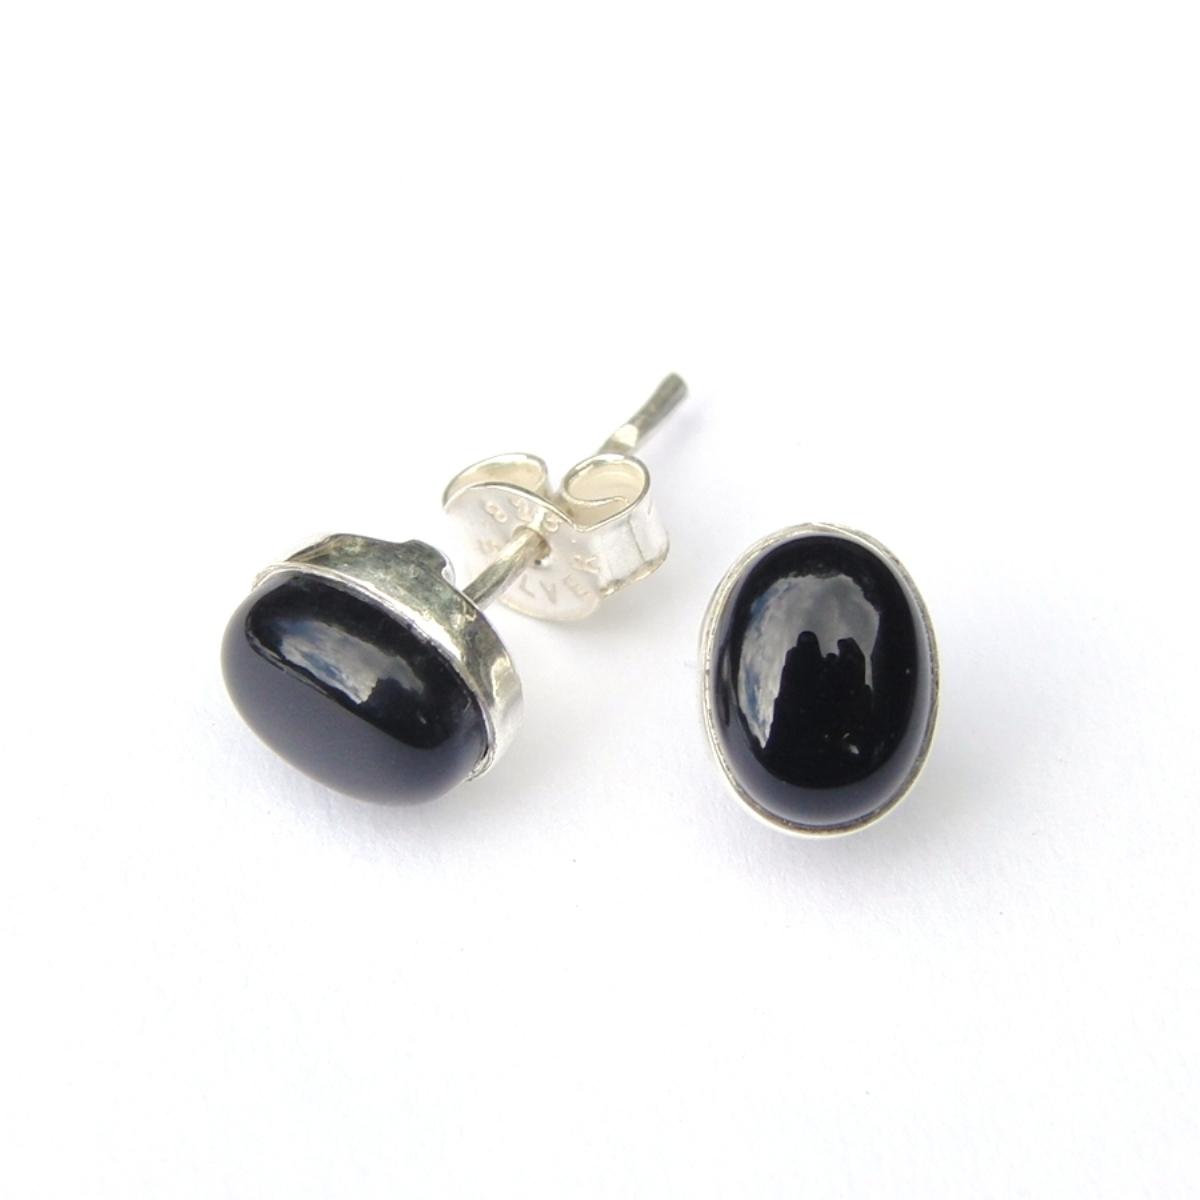 Black Onyx Small Oval Studs